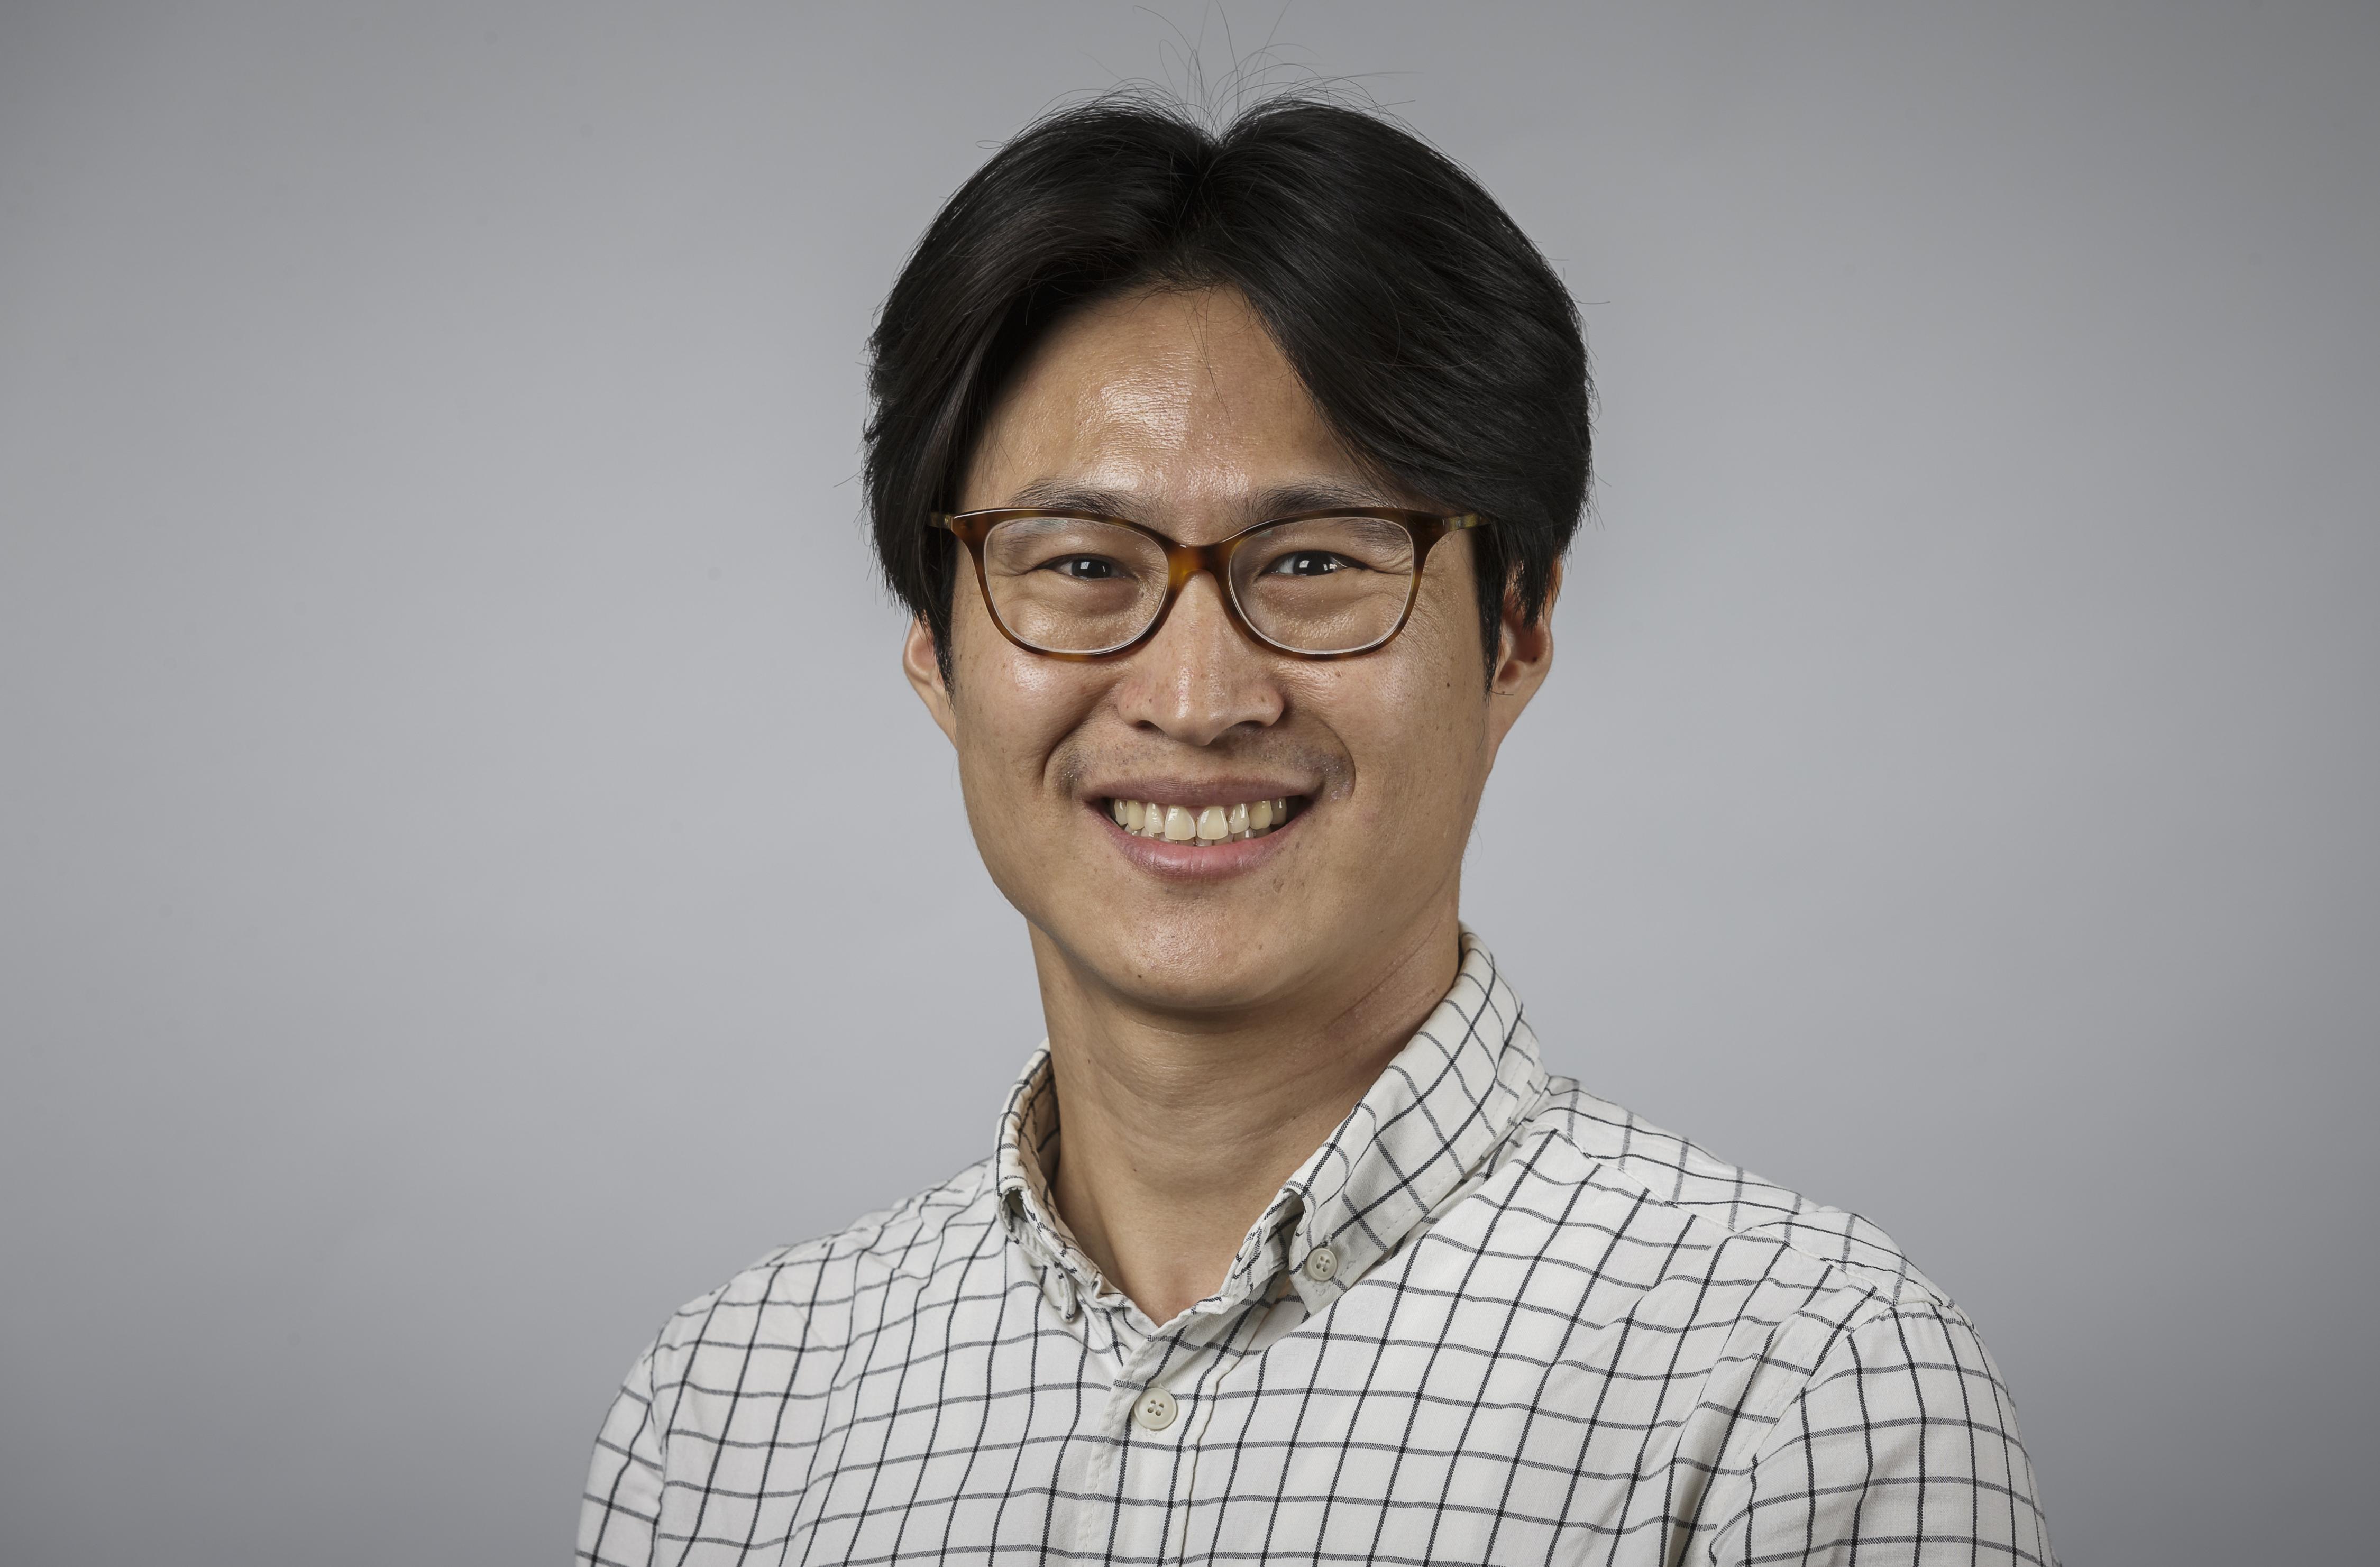 Hyungmo Yang